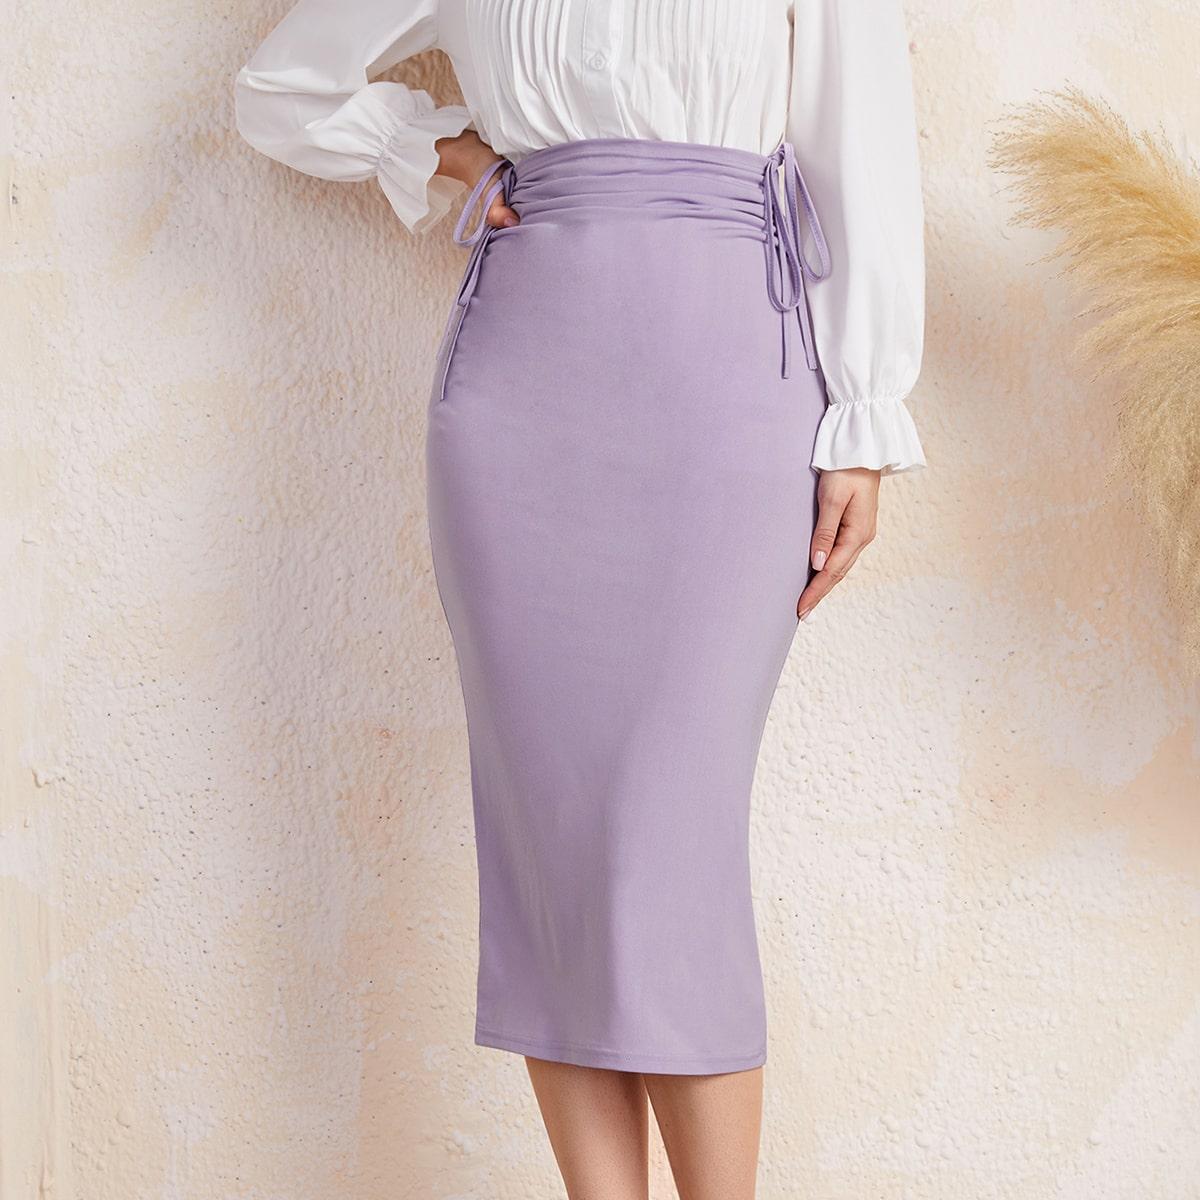 Falda de lápiz unicolor de talle alto